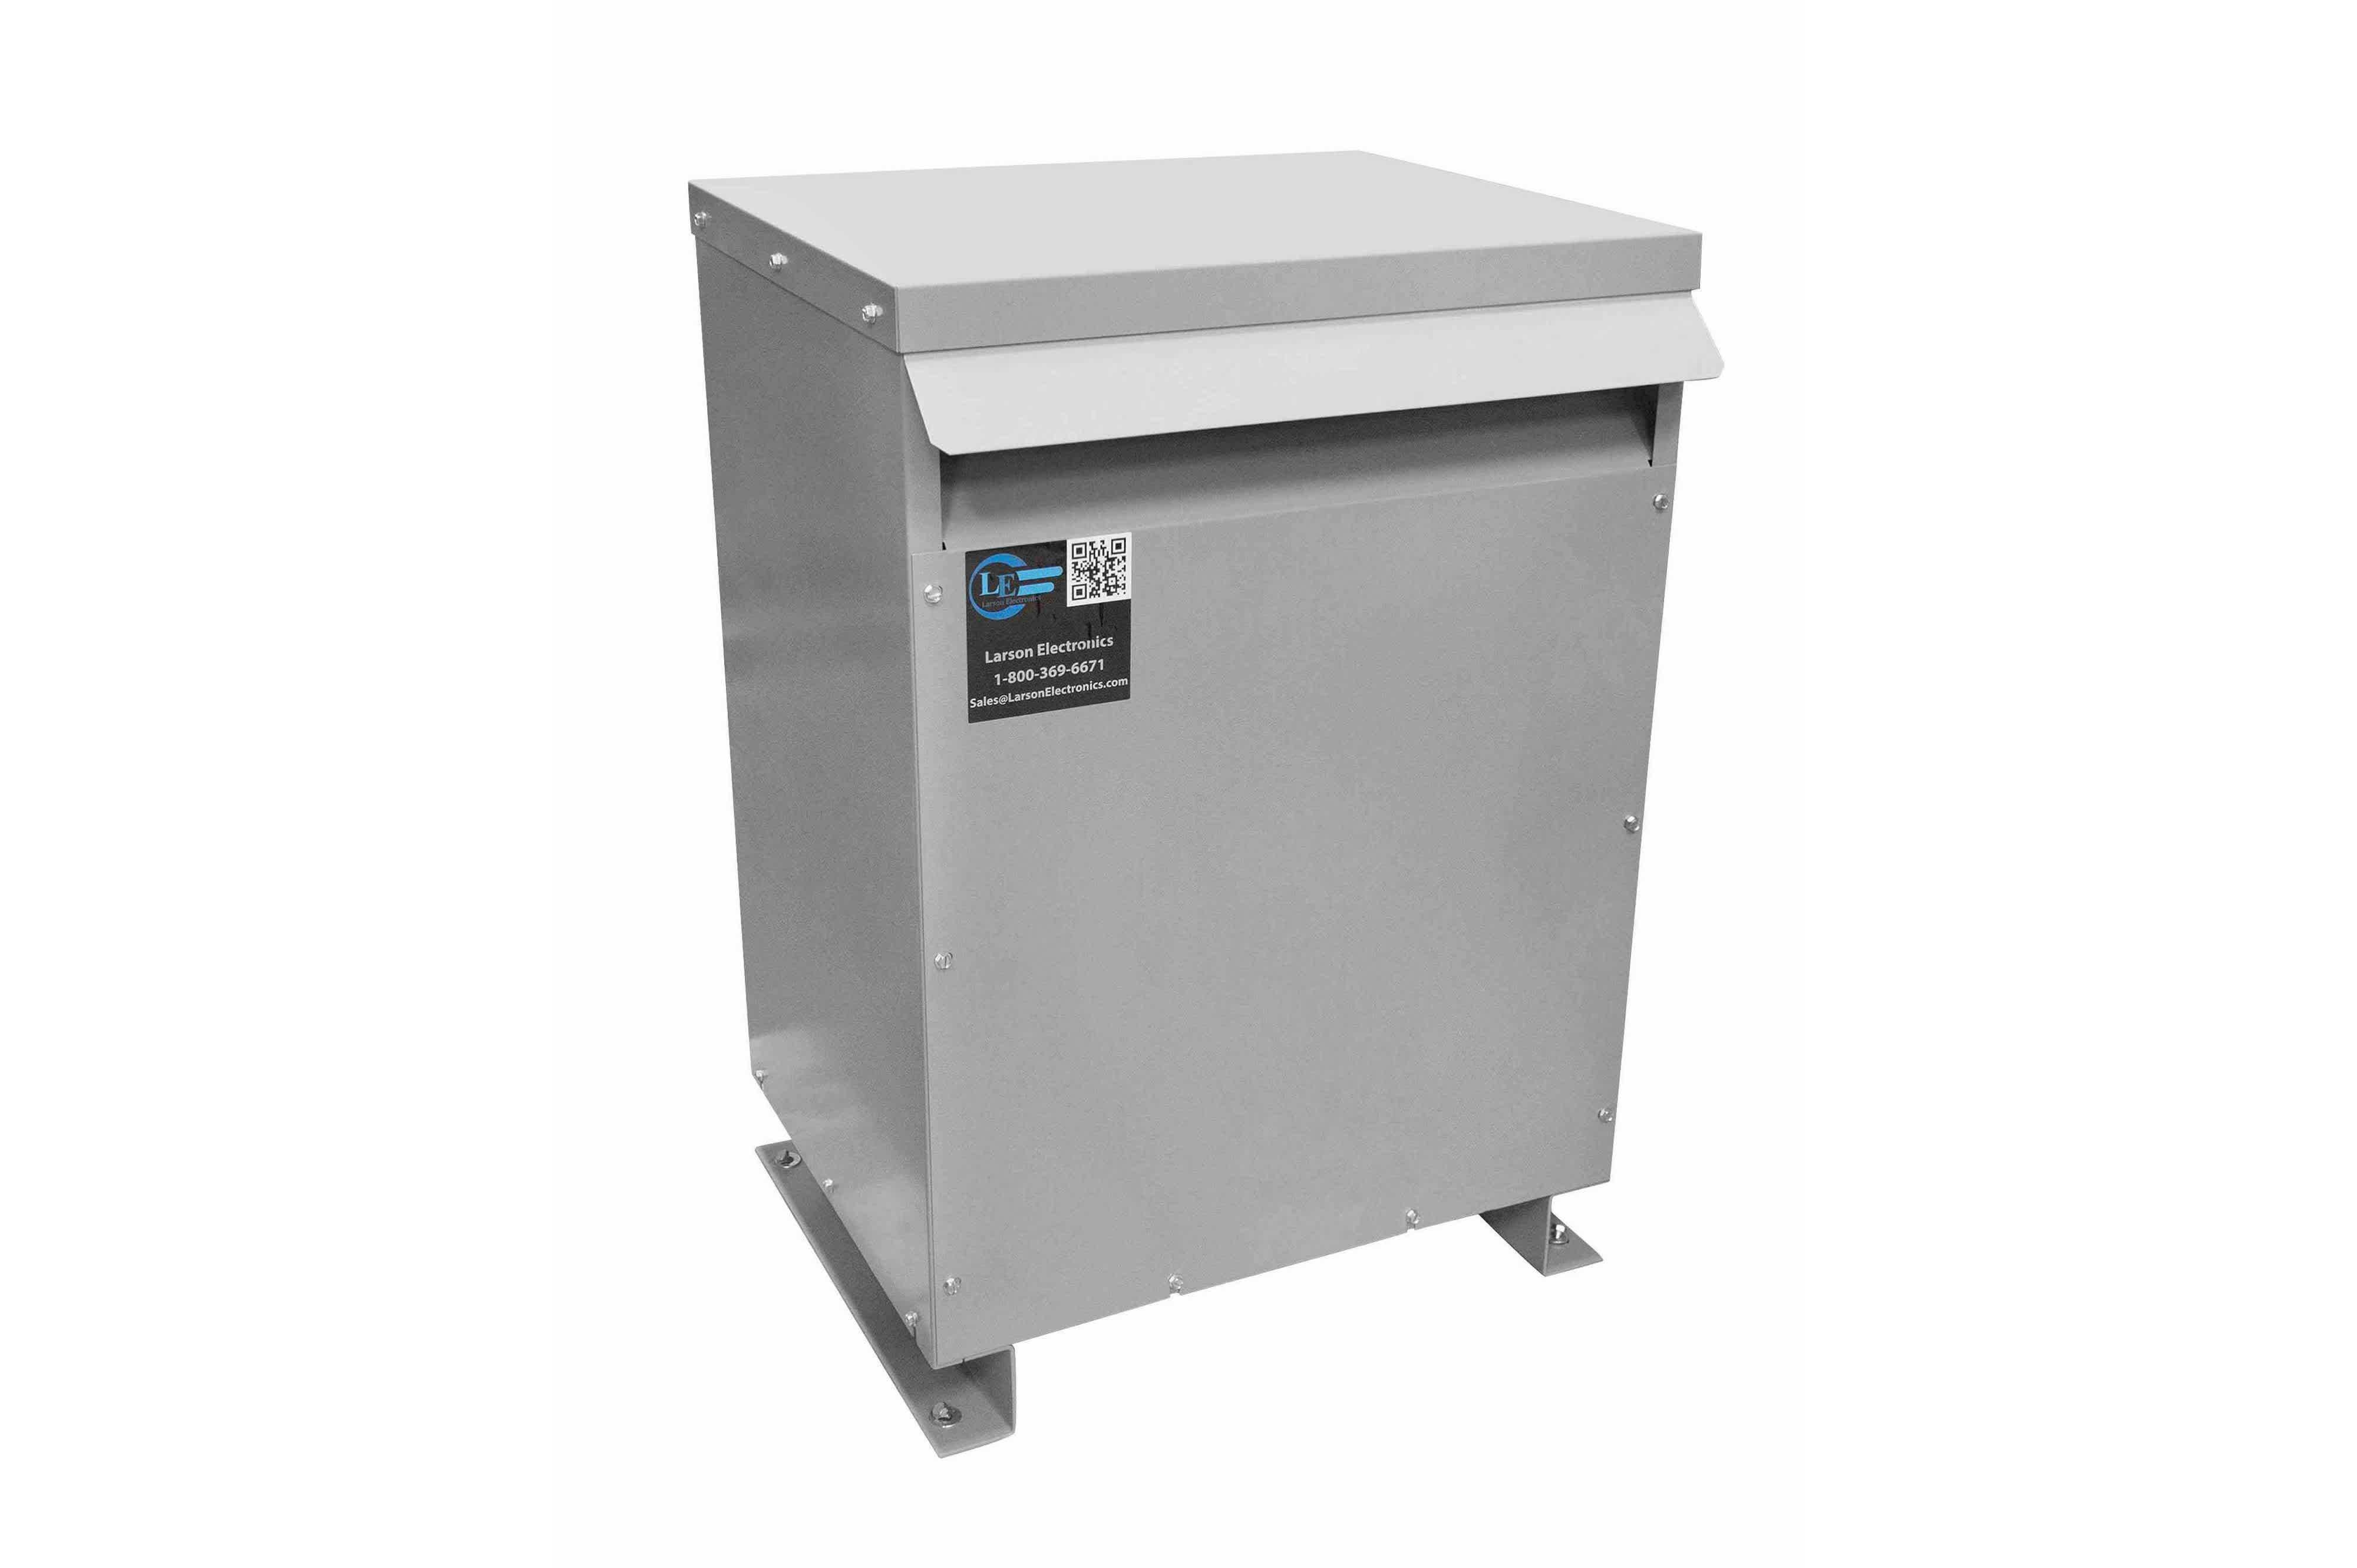 70 kVA 3PH Isolation Transformer, 240V Wye Primary, 480Y/277 Wye-N Secondary, N3R, Ventilated, 60 Hz